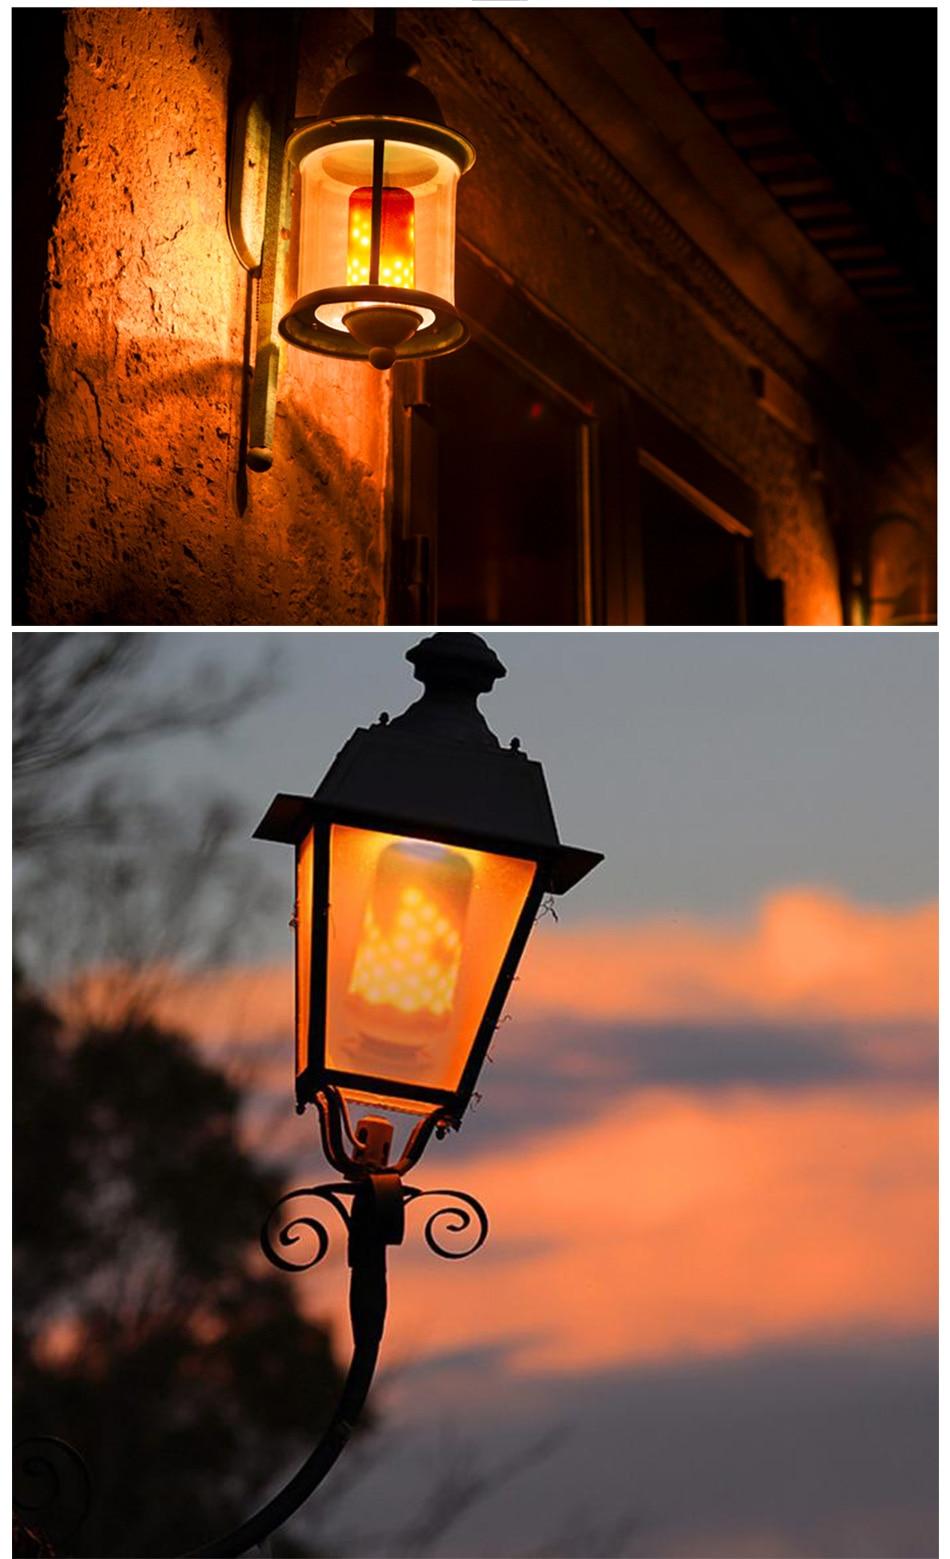 LED Flame Lamp Solar Waterproof Lawn Light Dancing Flickering Torch Lights Garden Outdoor Landscape Decorative Path Lighting (23)